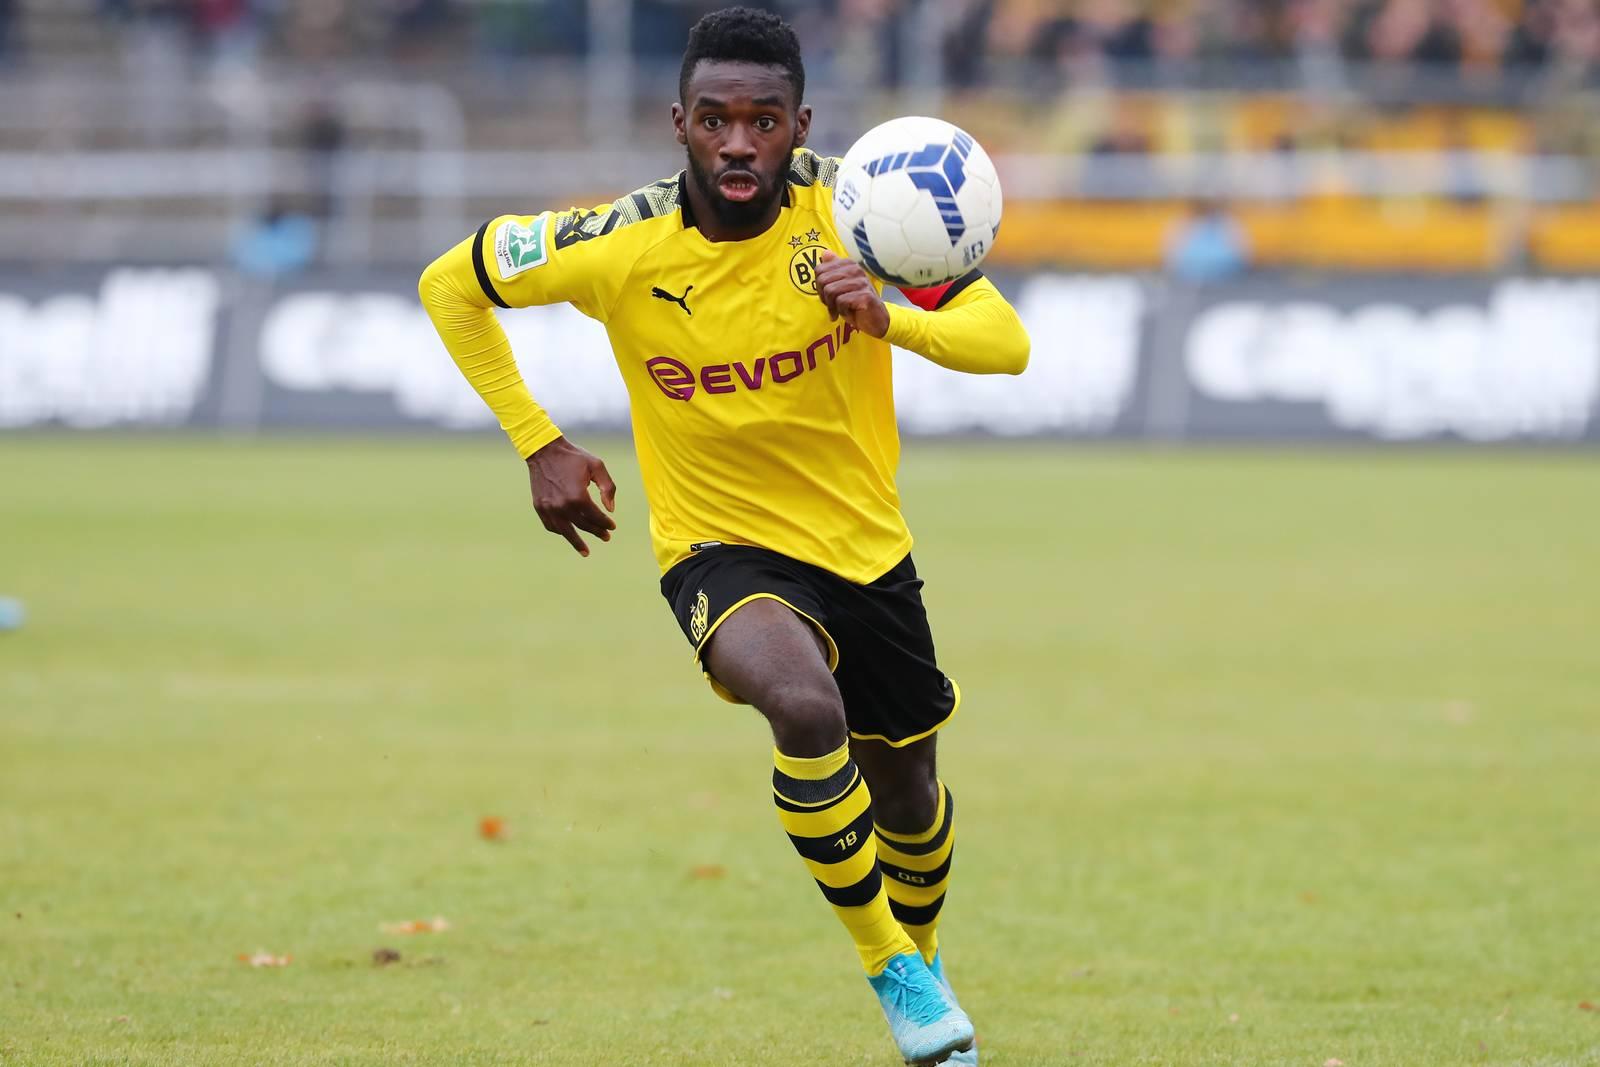 Joseph Boyamba bei der U23 des BVB